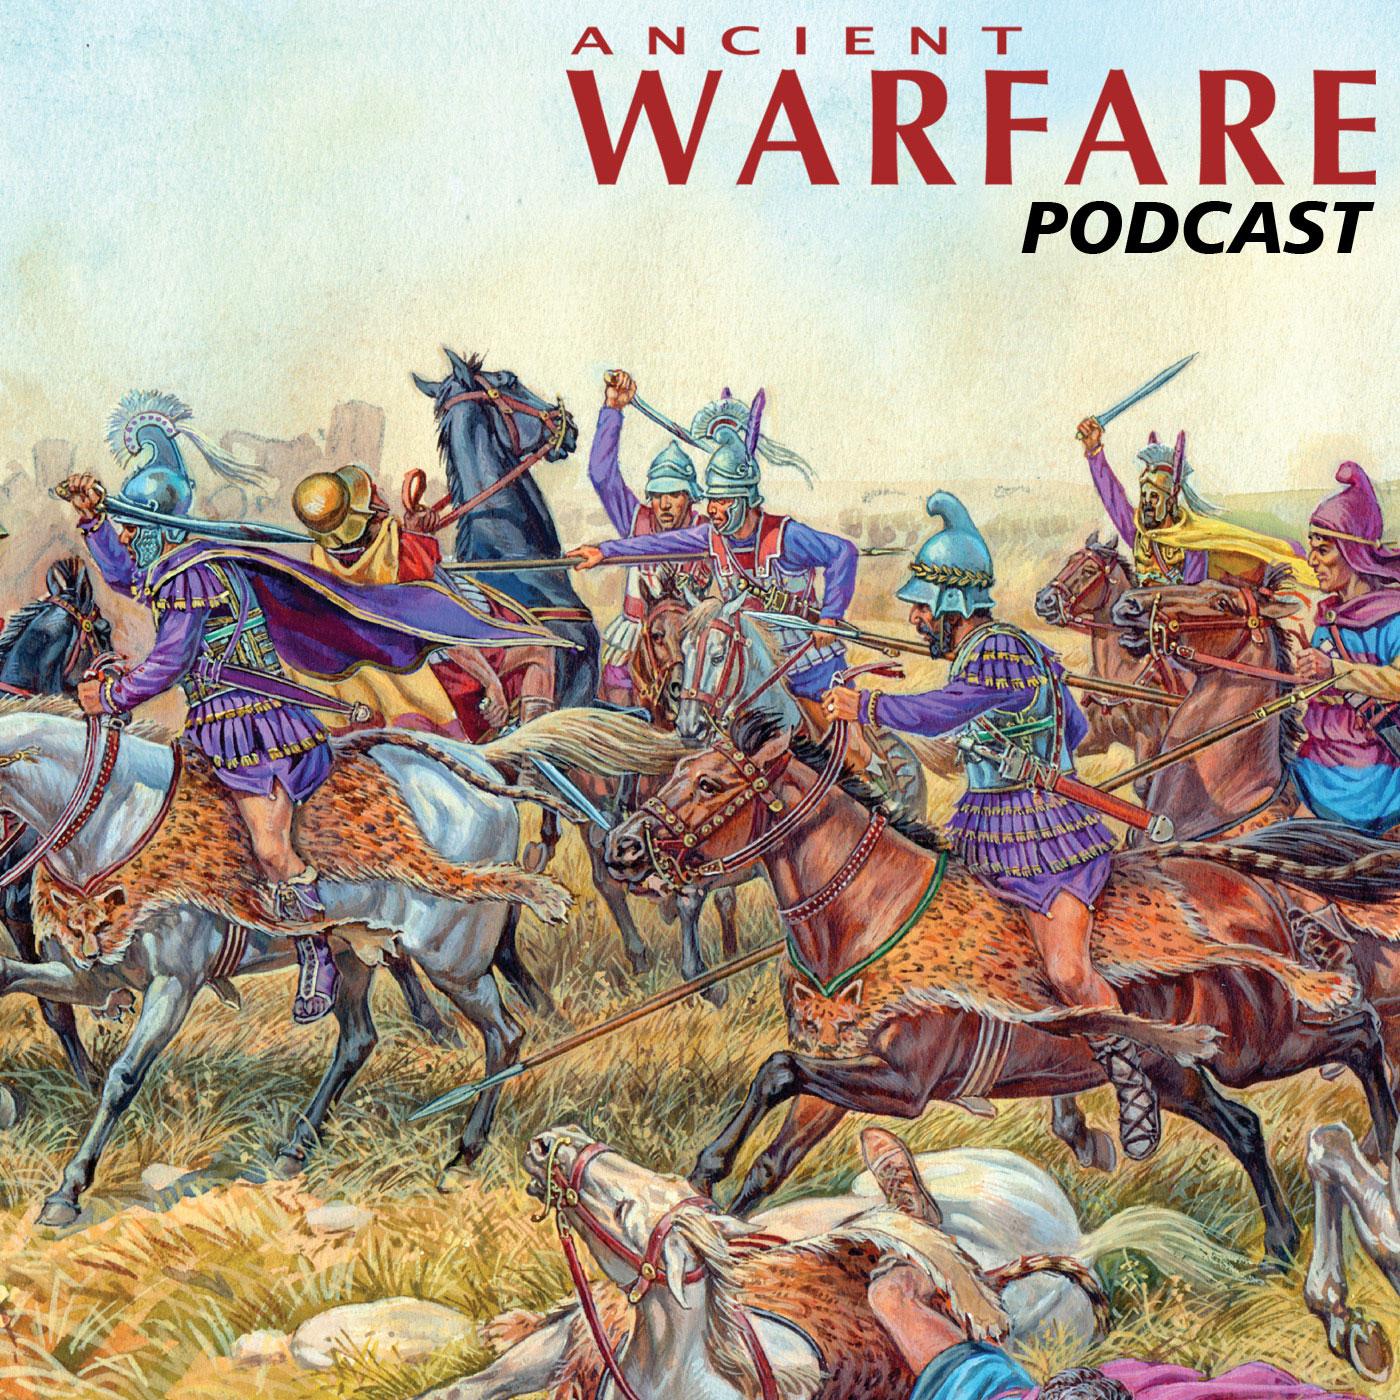 Ancient Warfare 2 the roman conquest of greece | ancient warfare podcast on acast